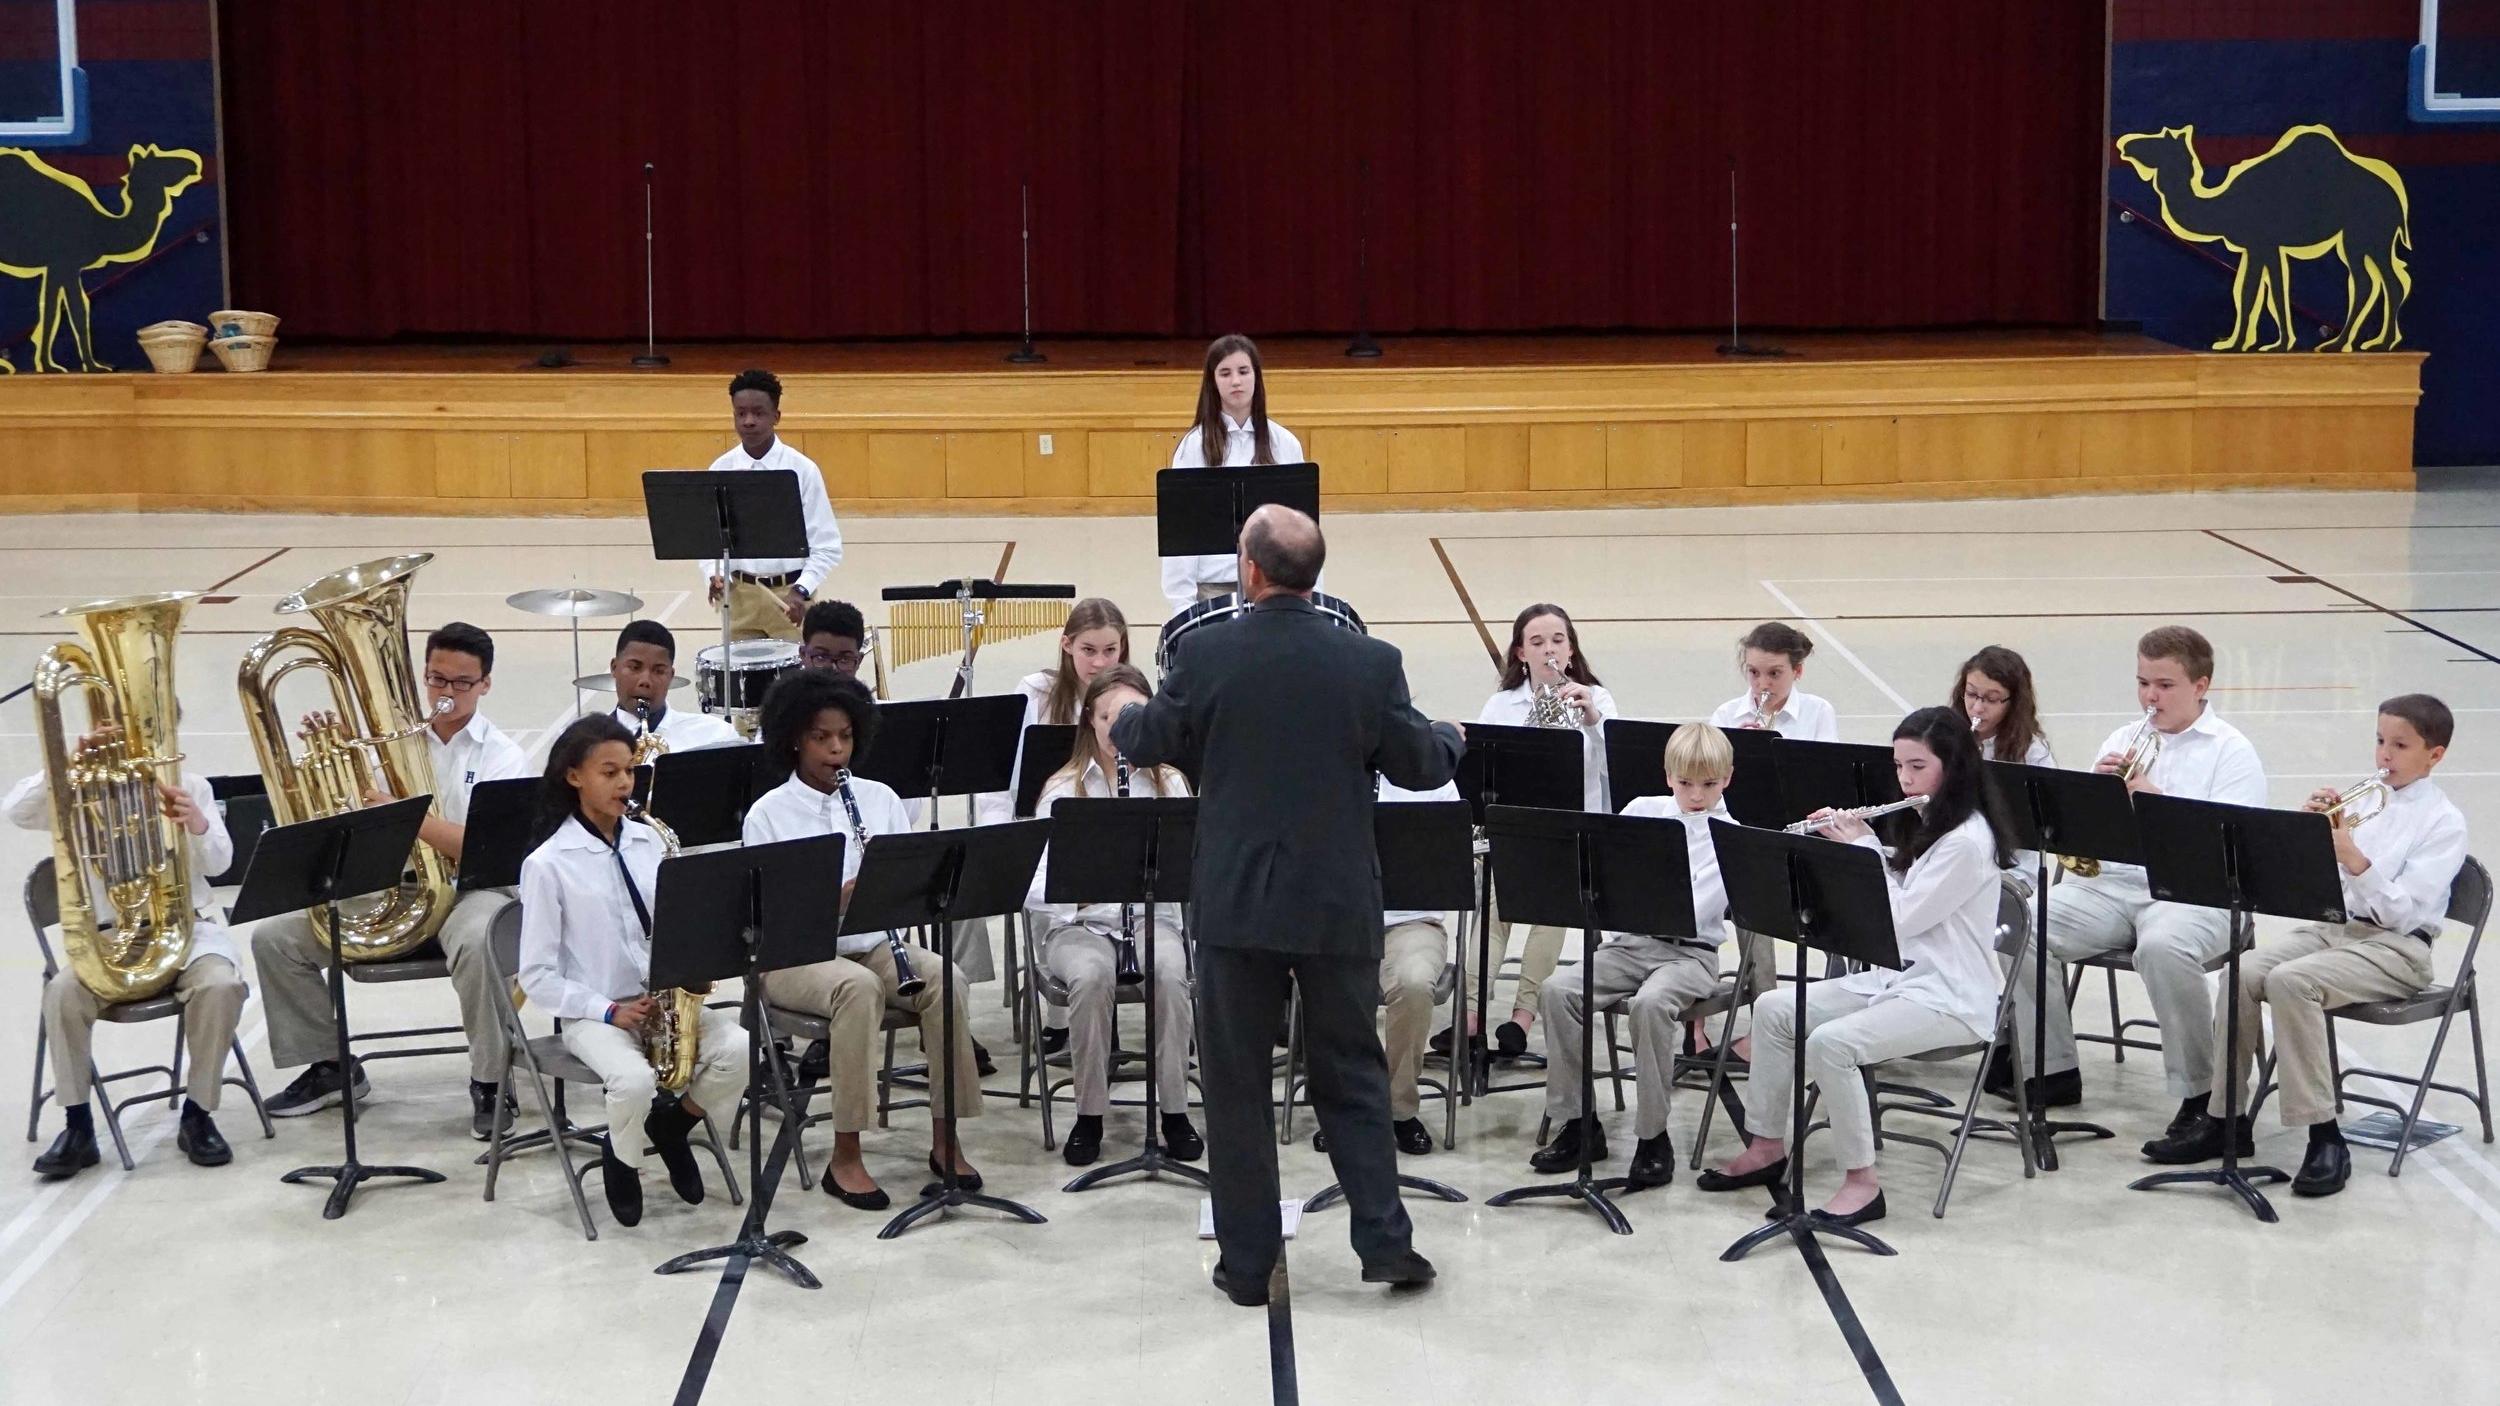 2016 Beginner Band Concert Cordova Lower School